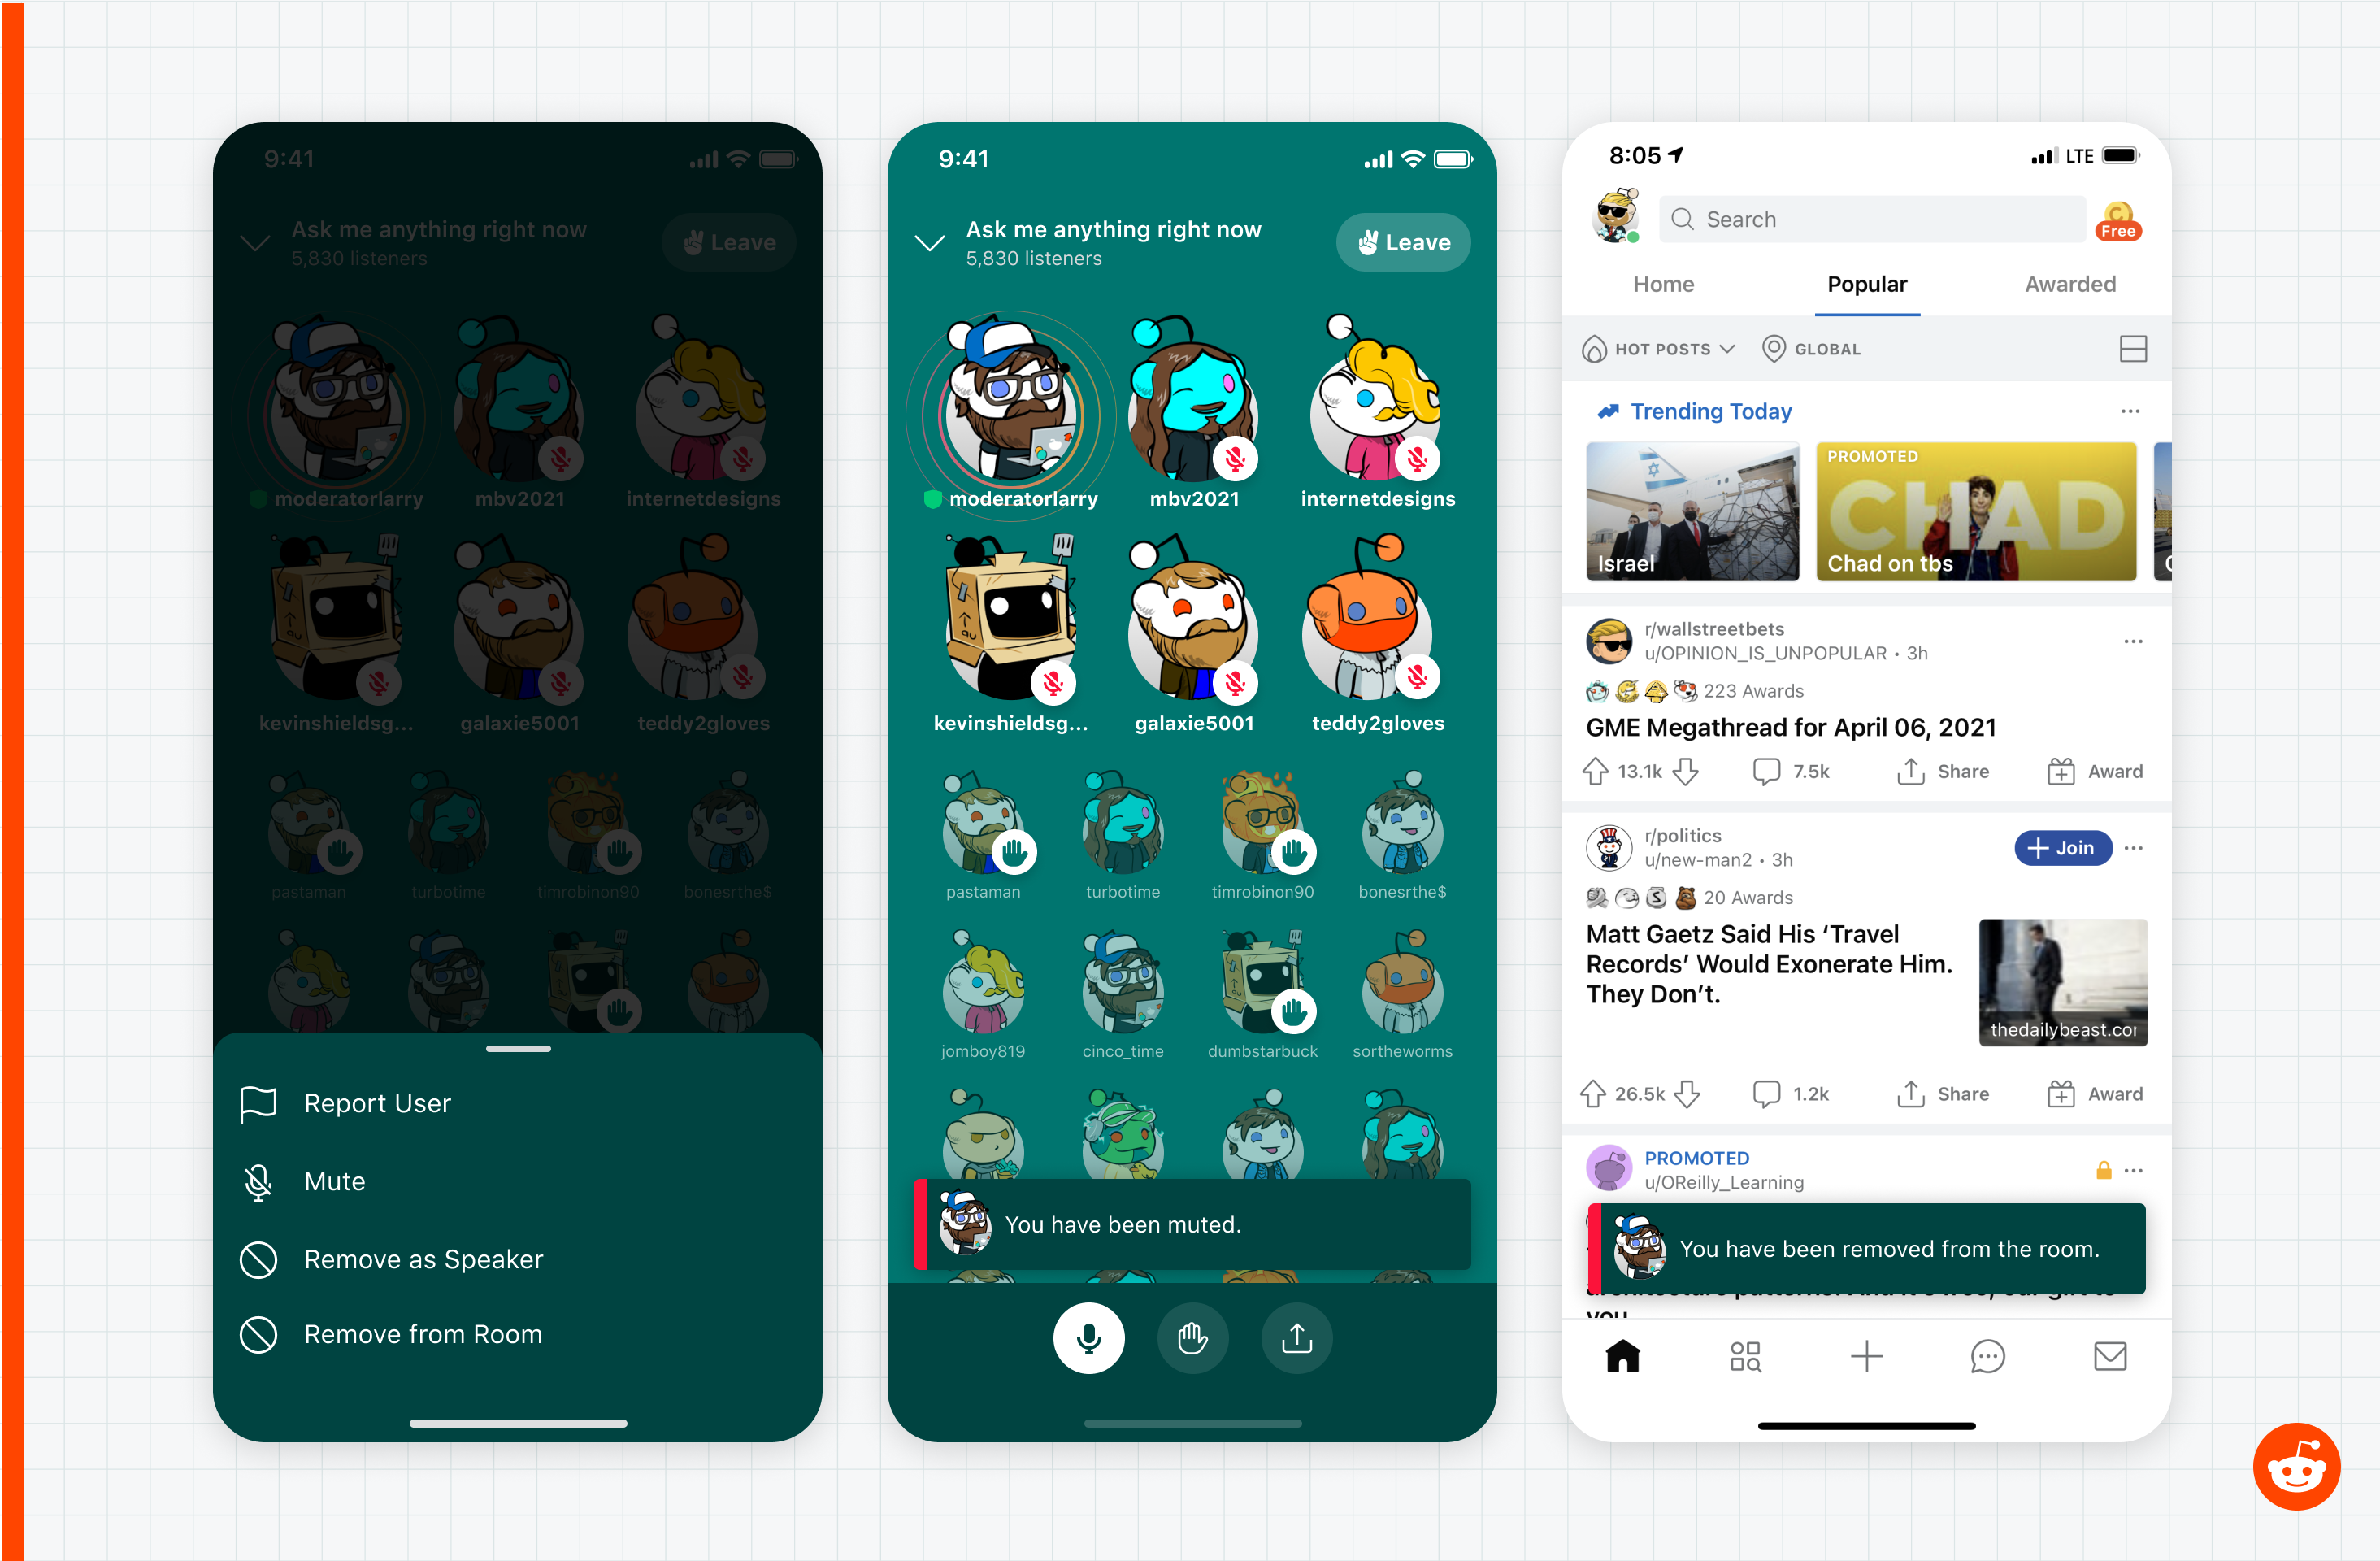 Reddit unveils its Clubhouse clone, Reddit Talk